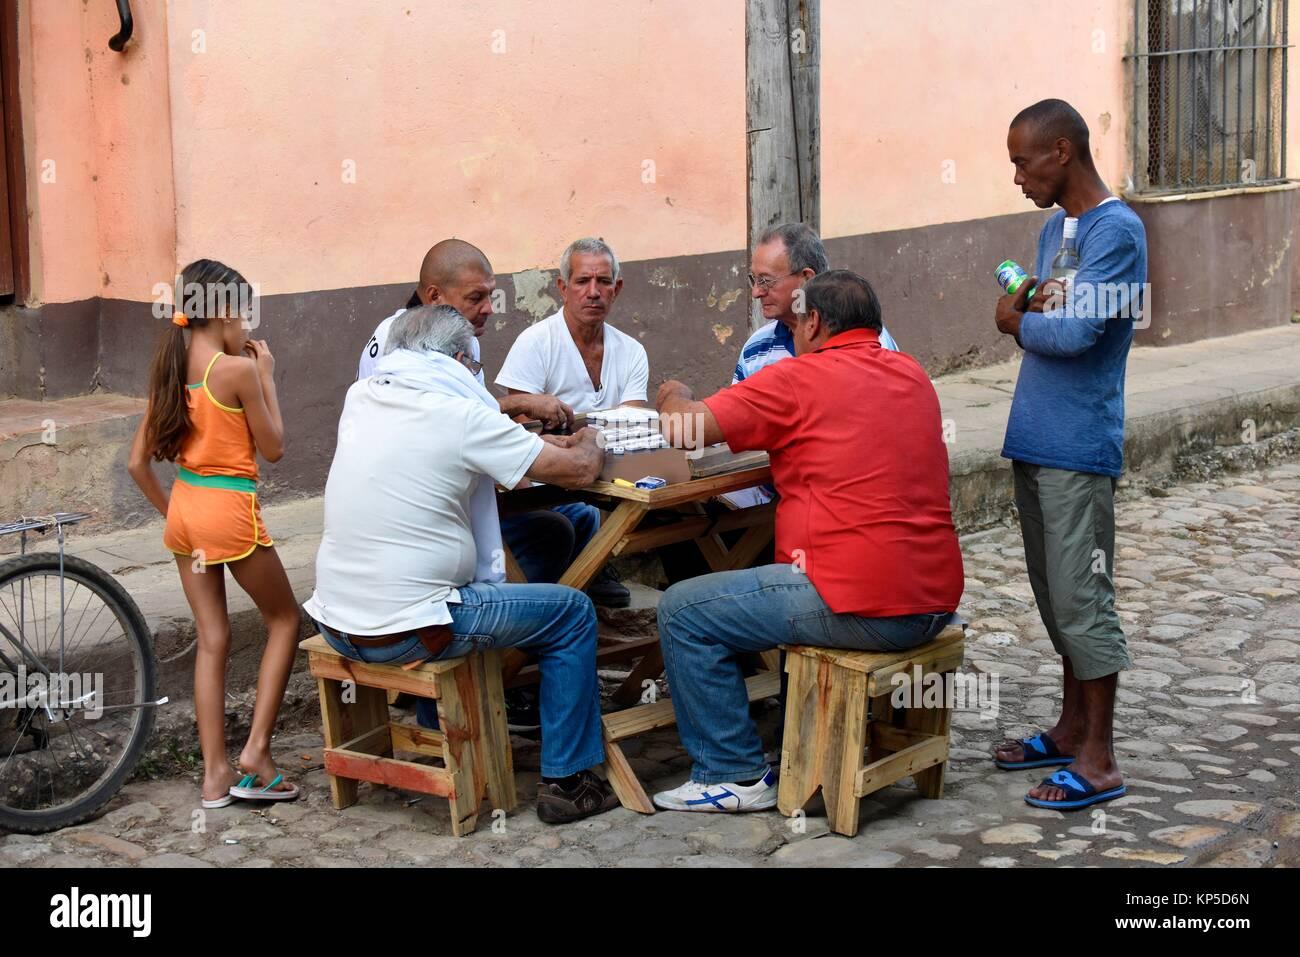 Cuban men playing domino in a sreet of Trinidad, Cuba. - Stock Image